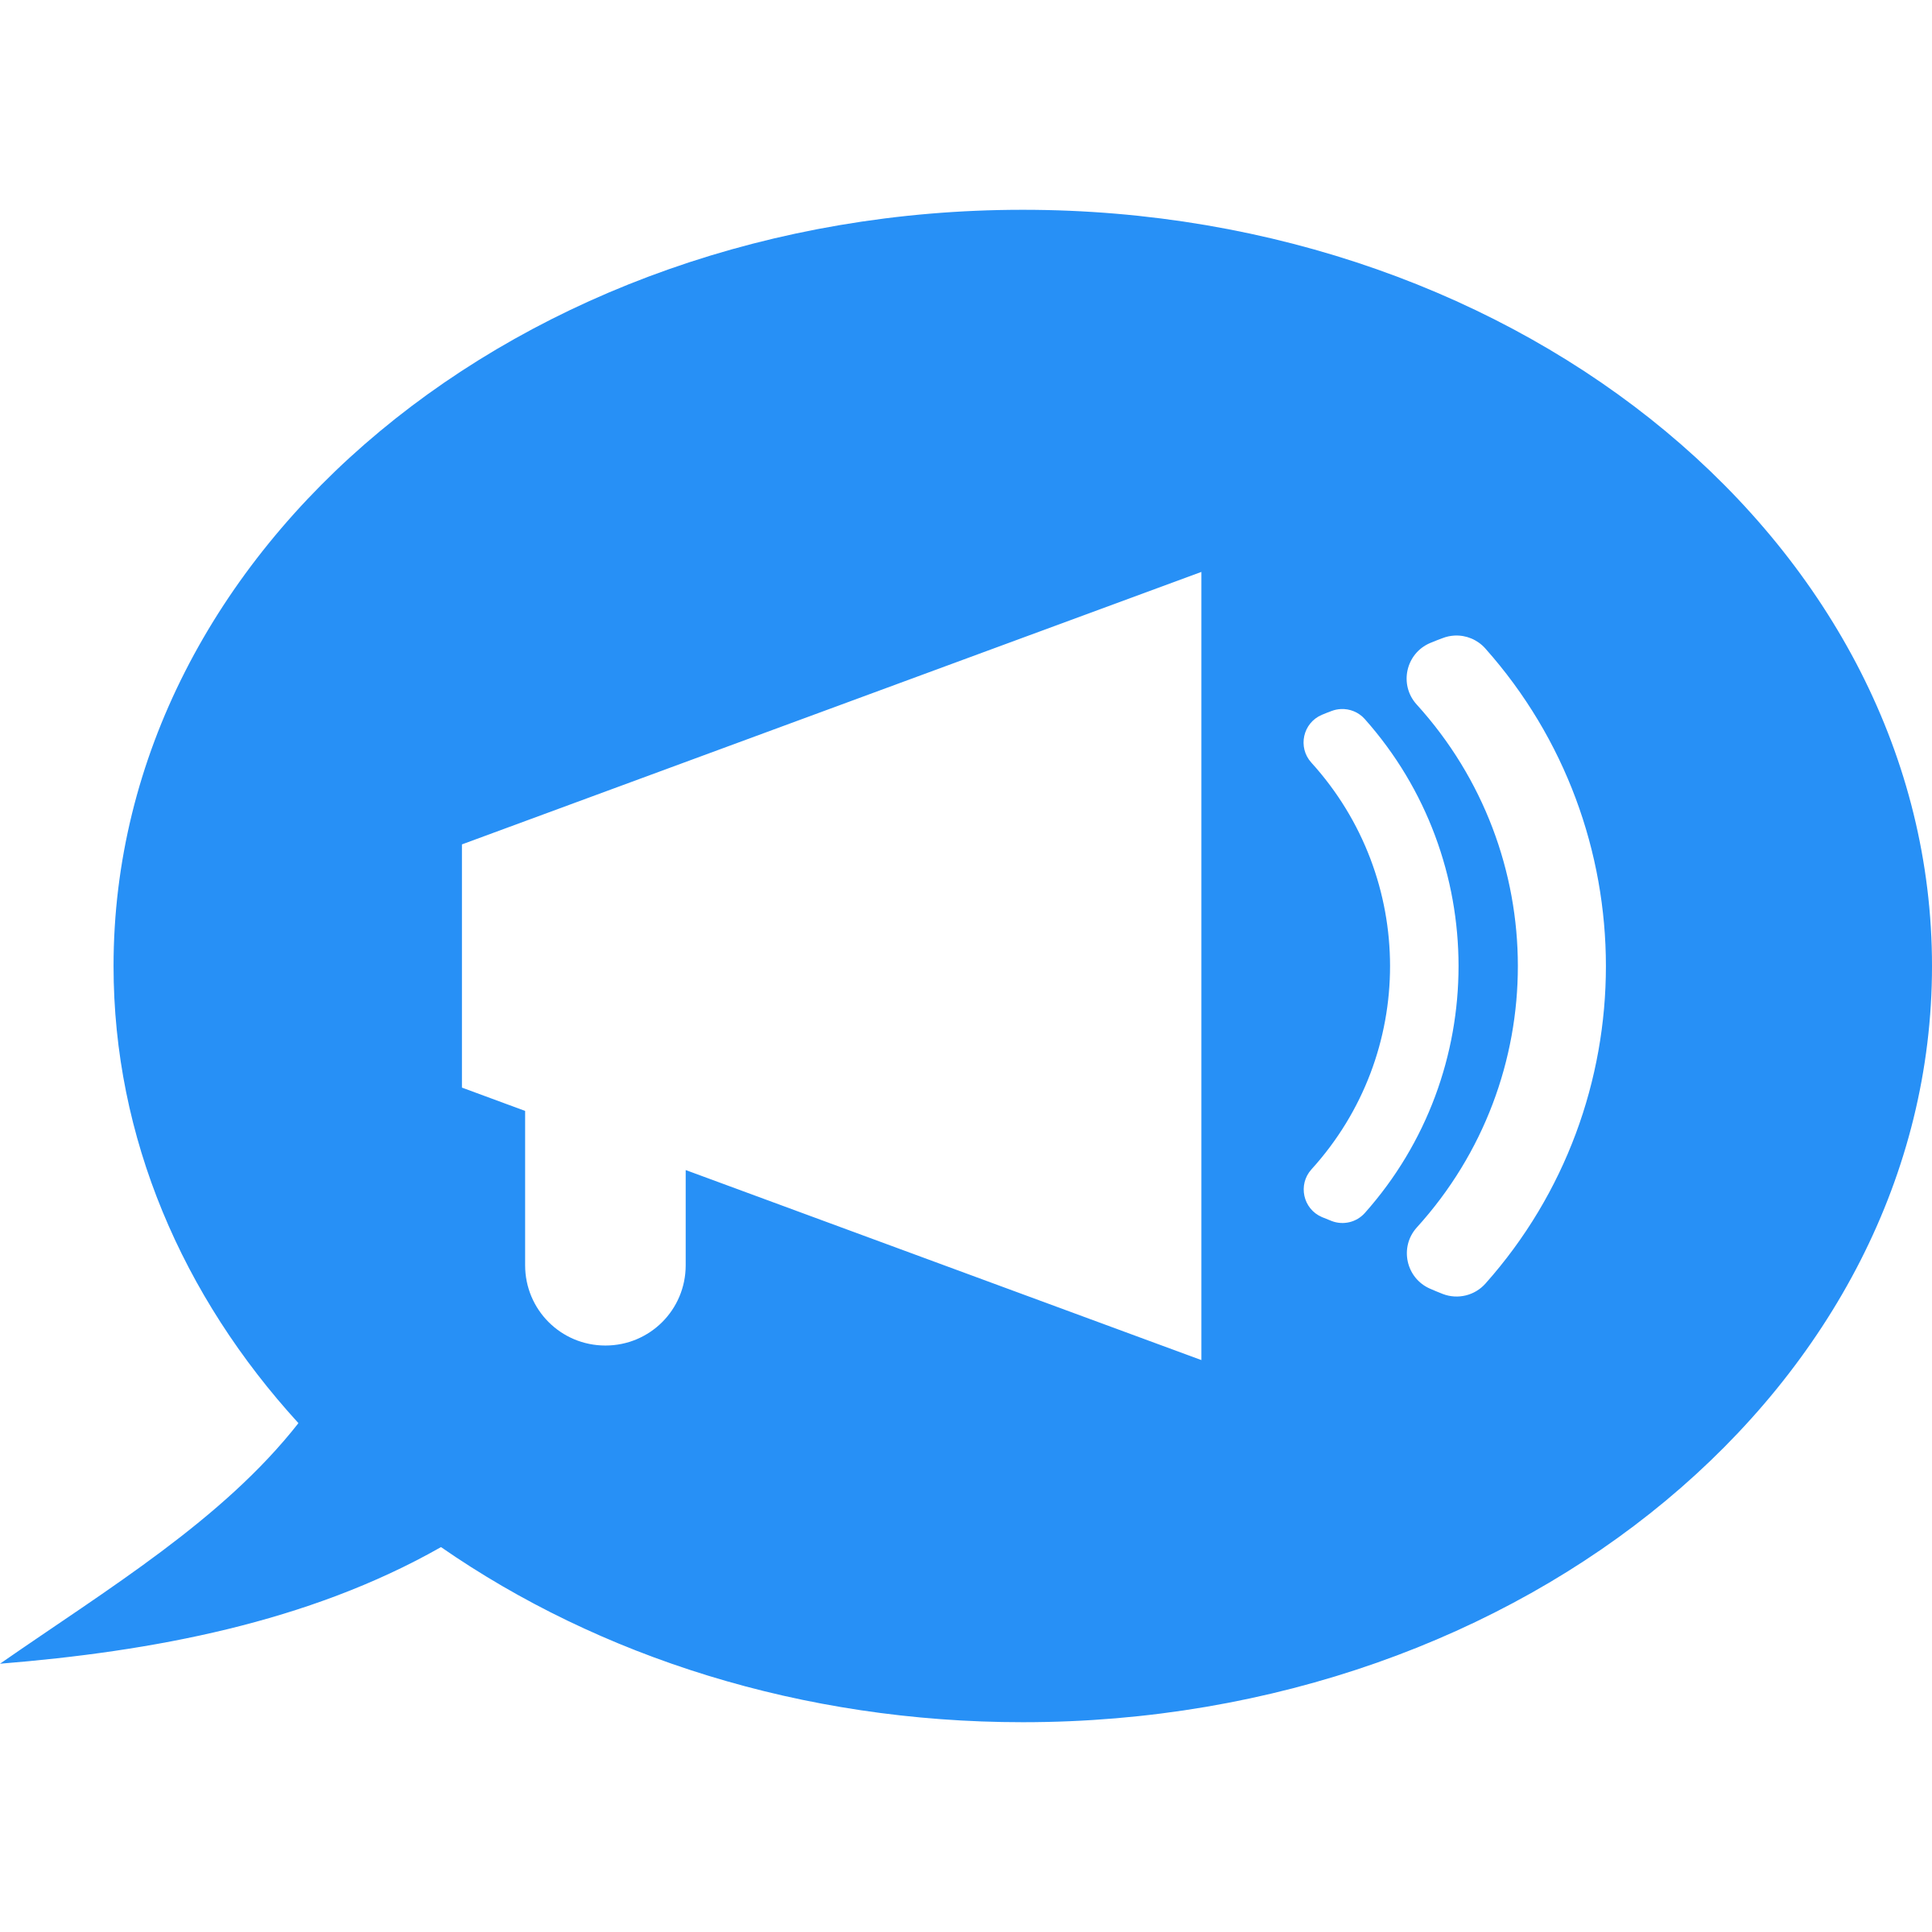 Communication PNG Transparent Images.